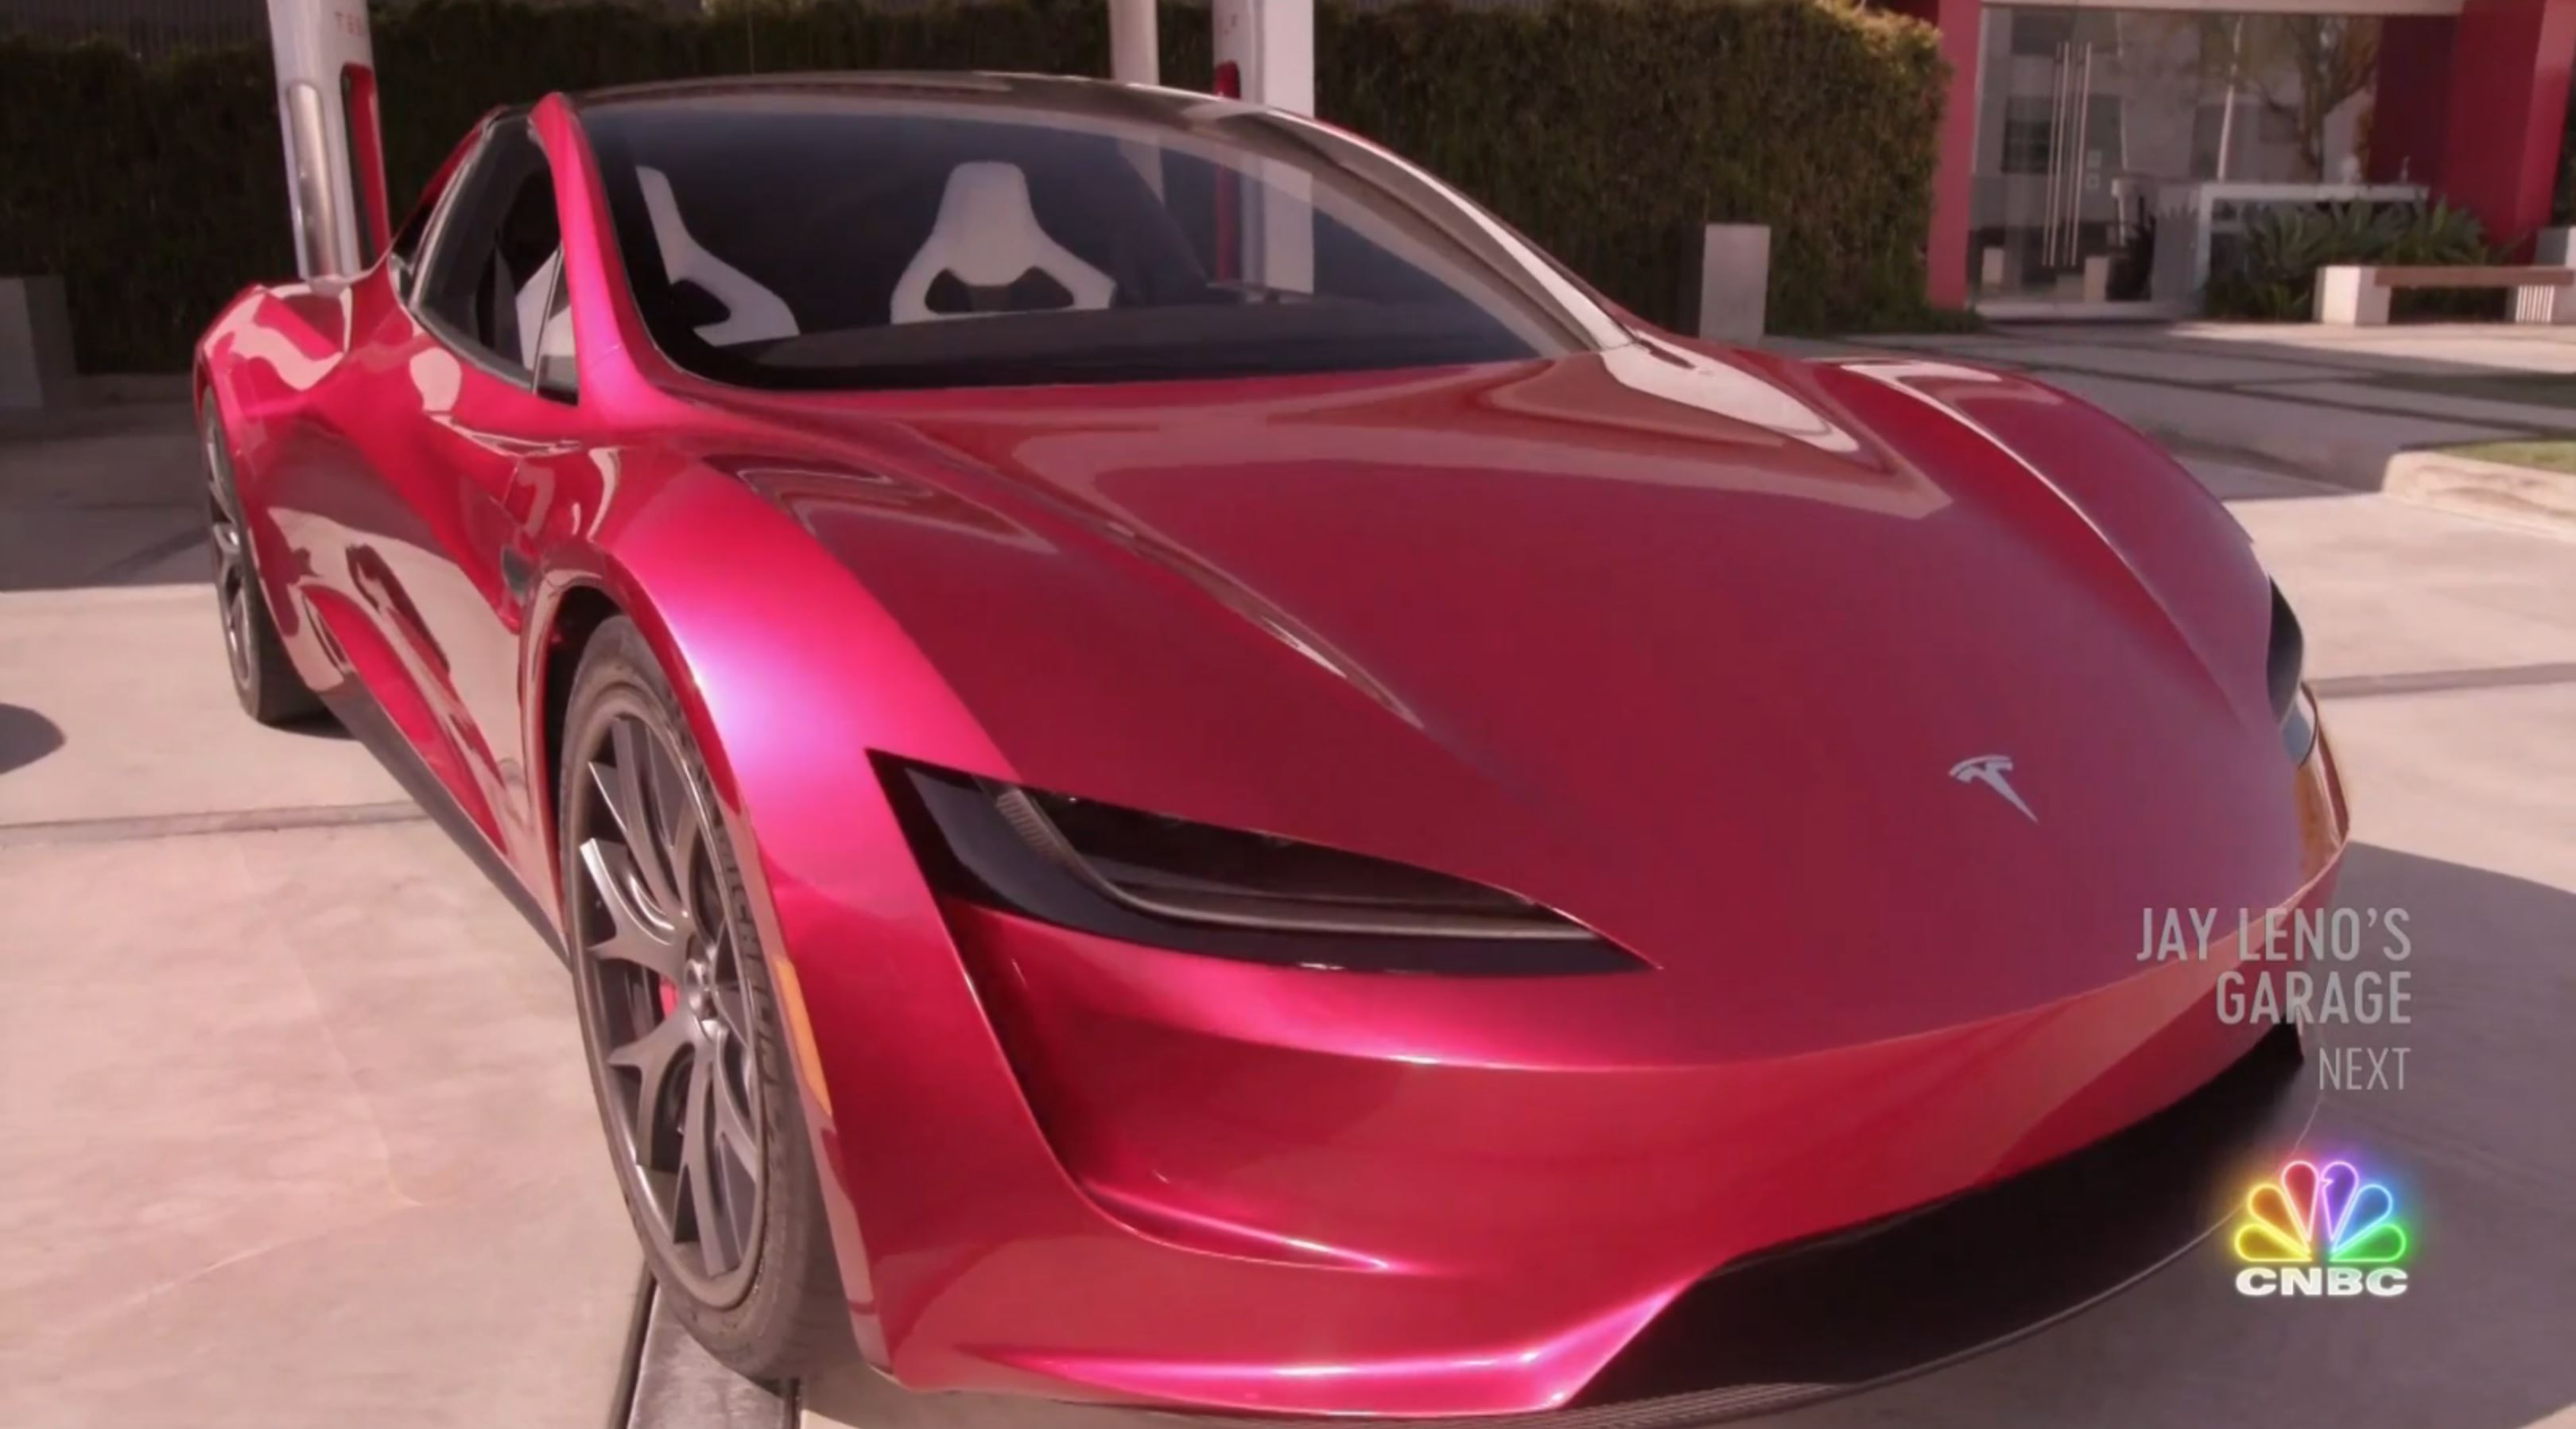 Jay Leno Tesla Franz segment (NBC) 15